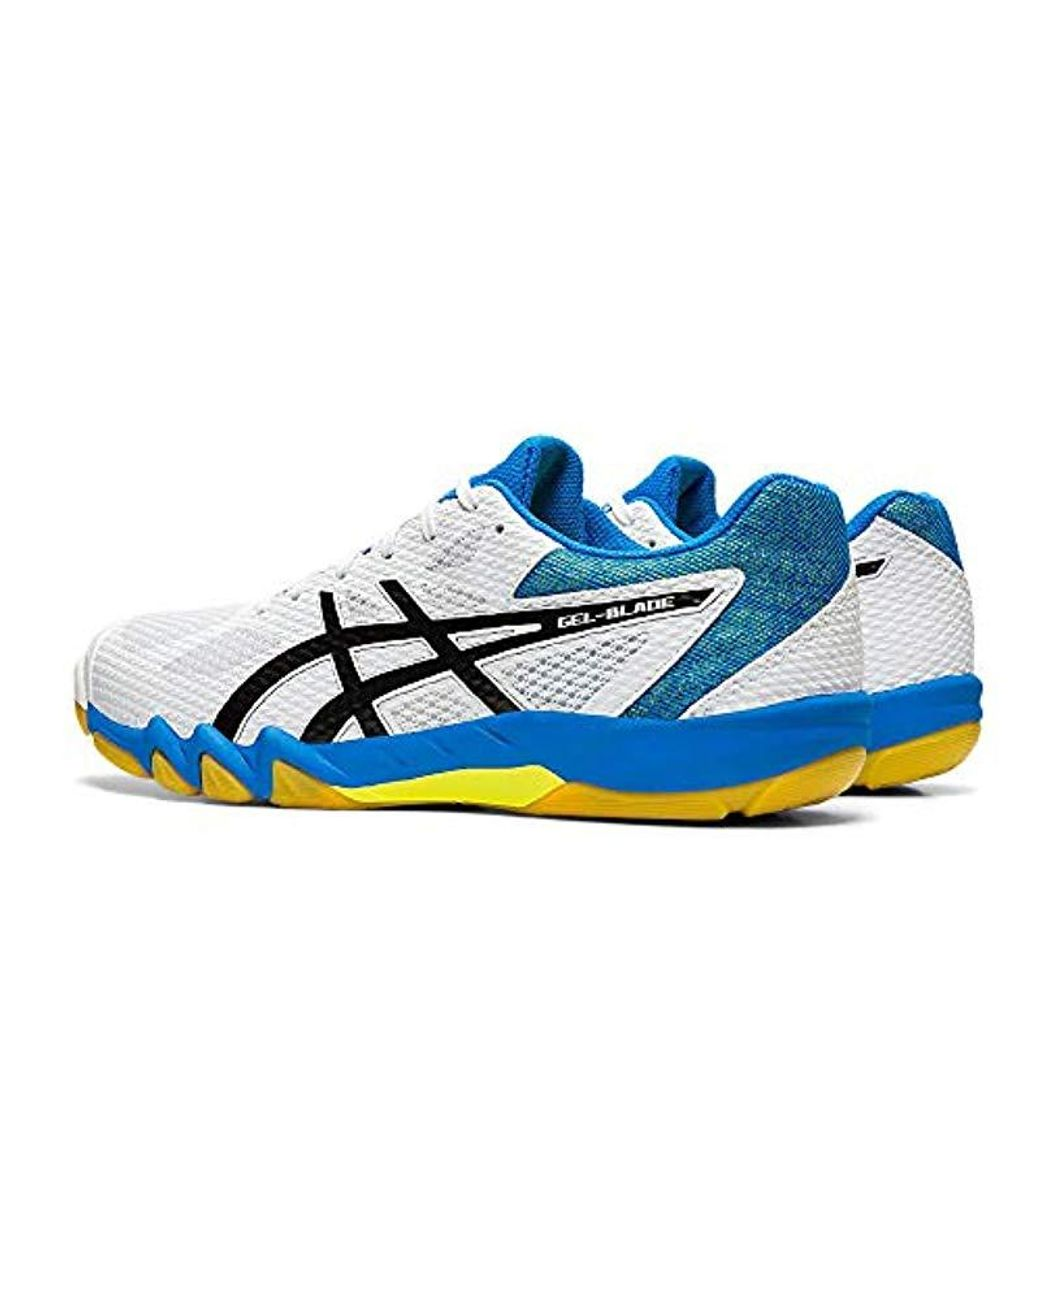 Men's White Gel blade 7 1071a029 100 Squash Shoes